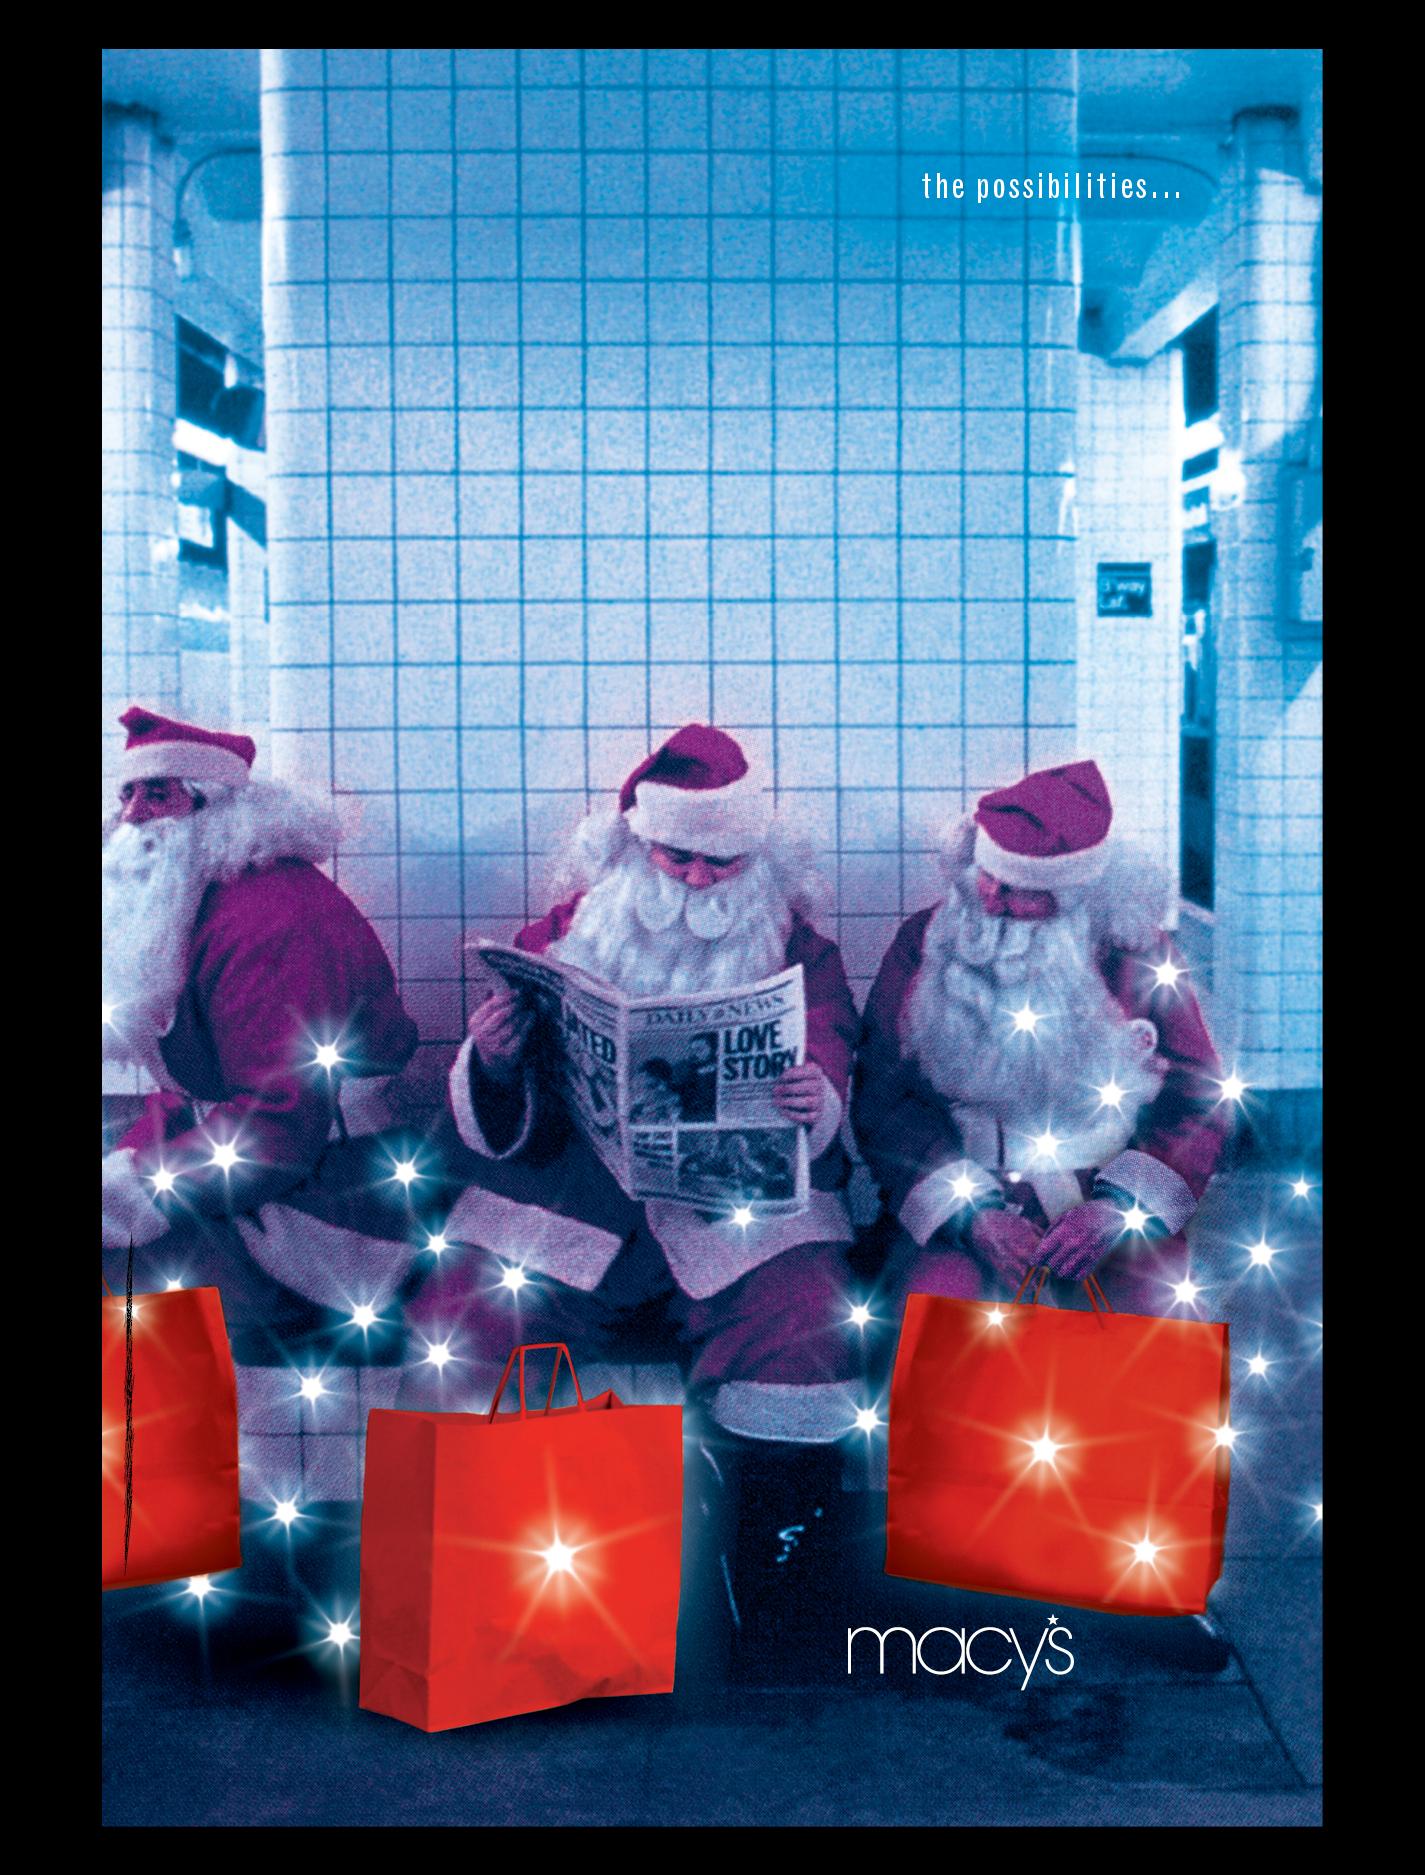 Macy's_Possibilities_Santa